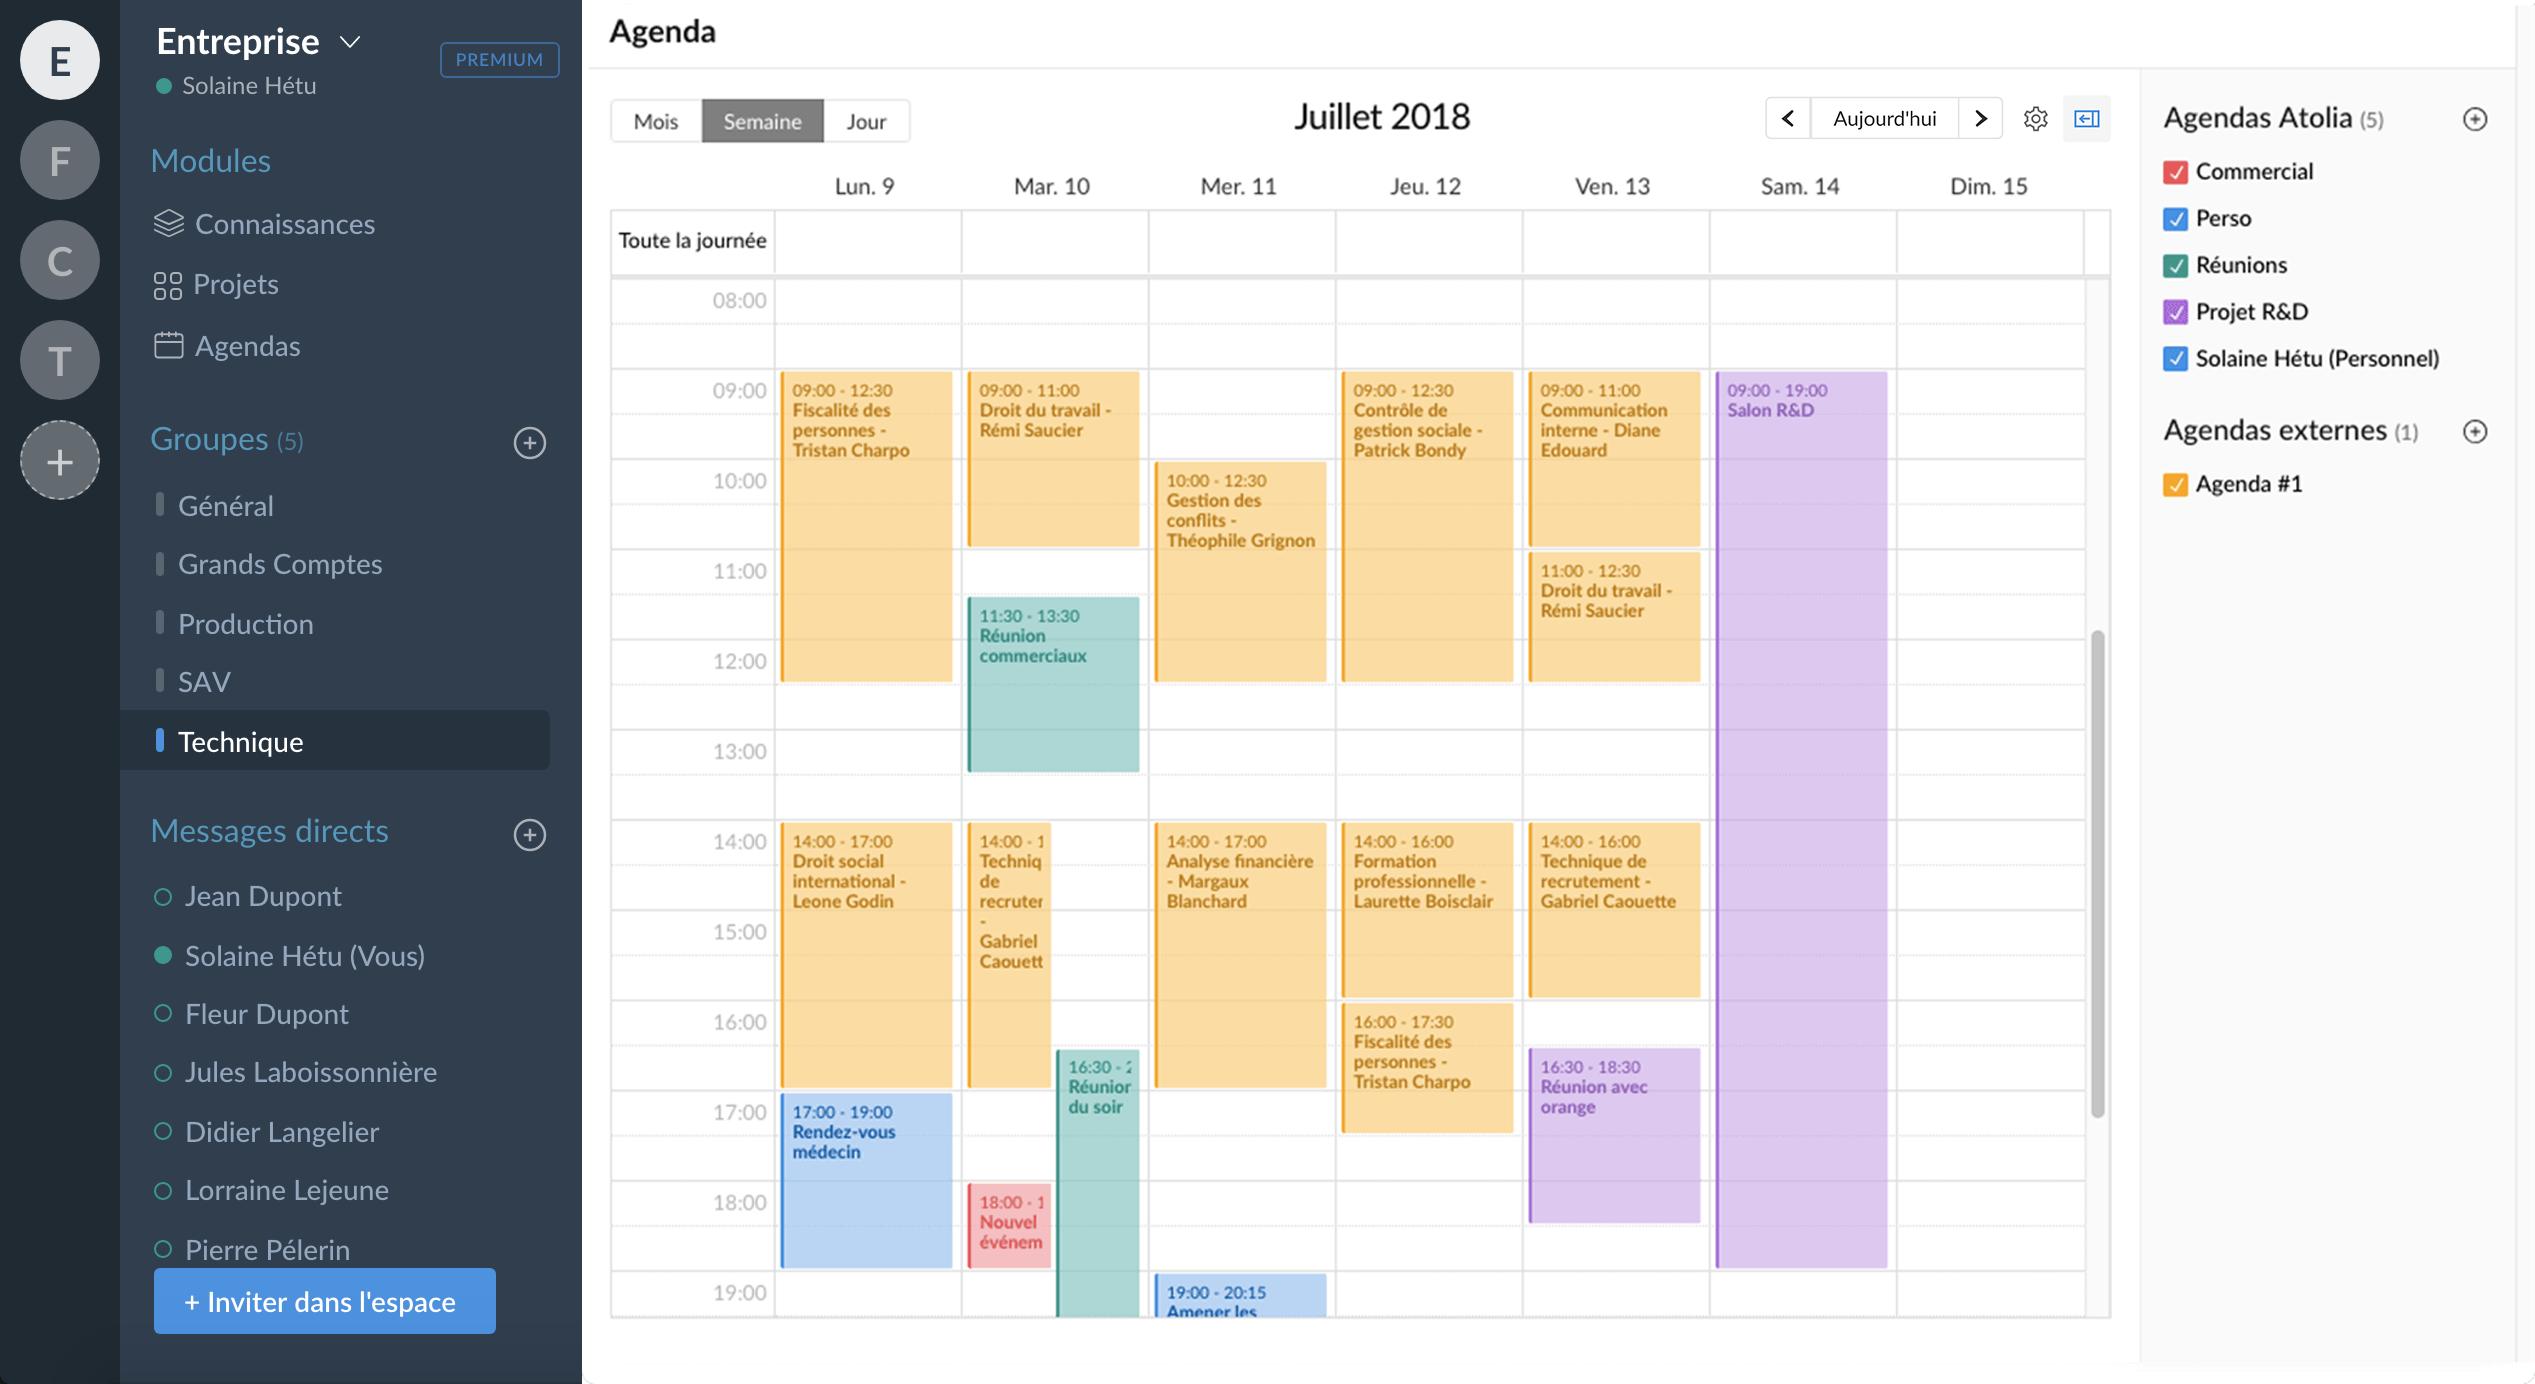 calendrier partagé : visuel atolia